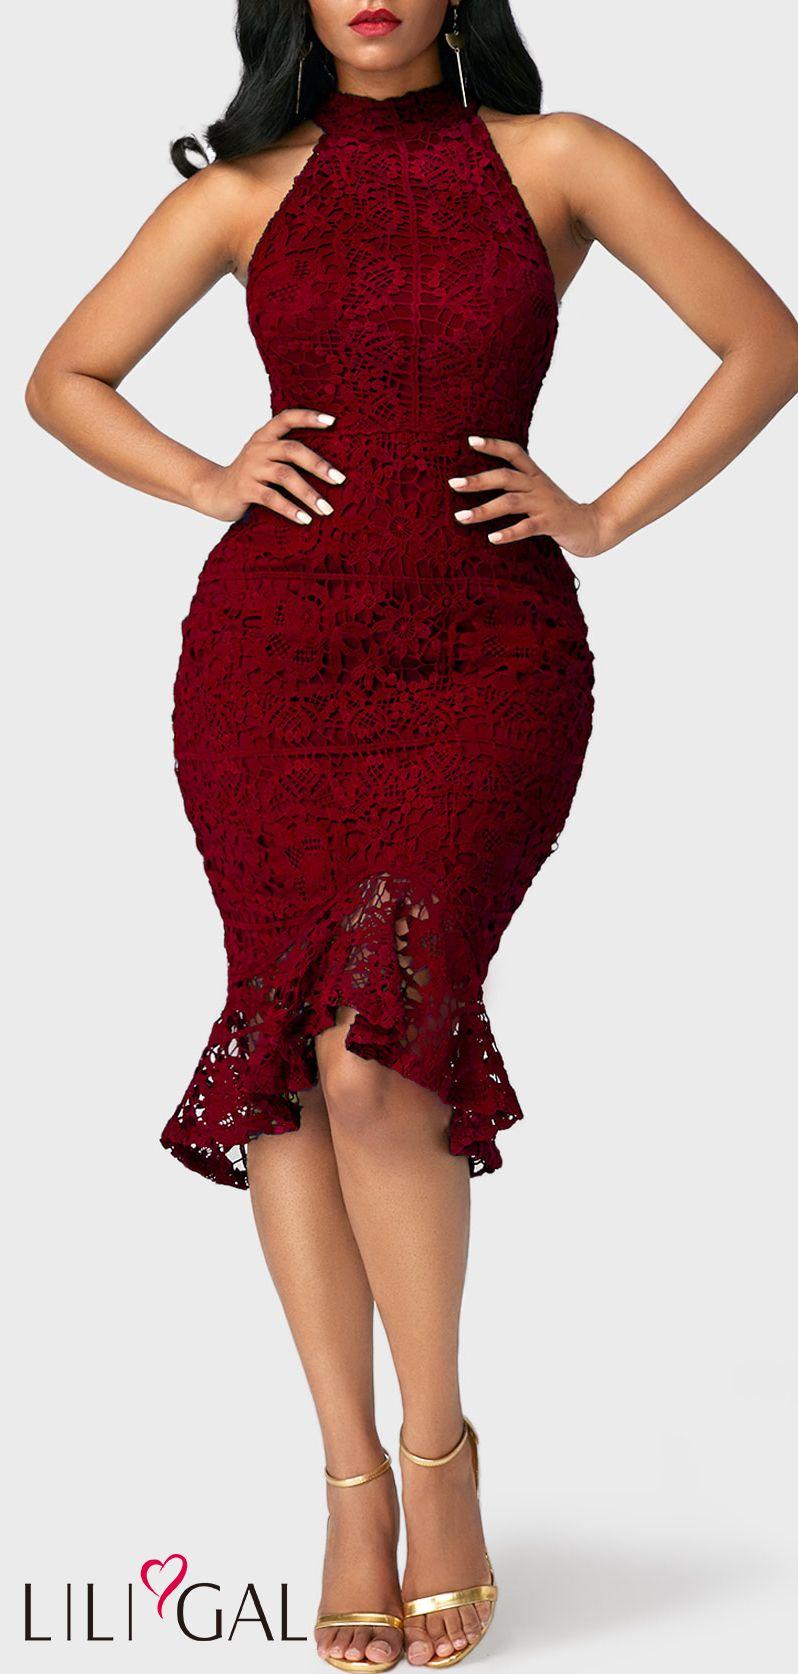 c632c6f3c93 Sleeveless Mock Neck Burgundy Lace Mermaid Bridesmaid Dress  liligal   dresses  womenswear  womensfashion